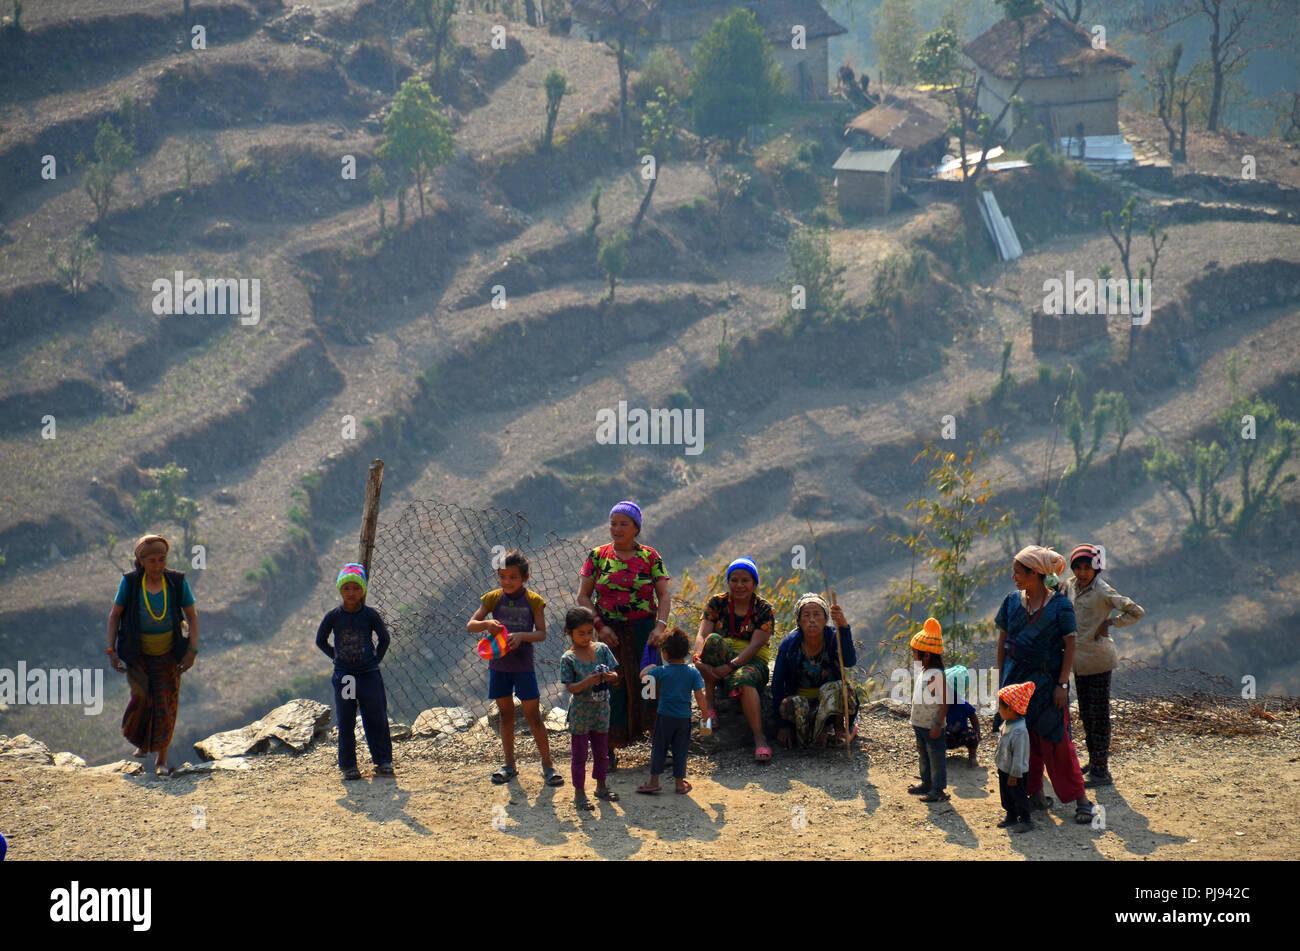 A group of Dalit (untouchable) people in the village of Tamakhani, Solukhumbu, Nepal - Stock Image